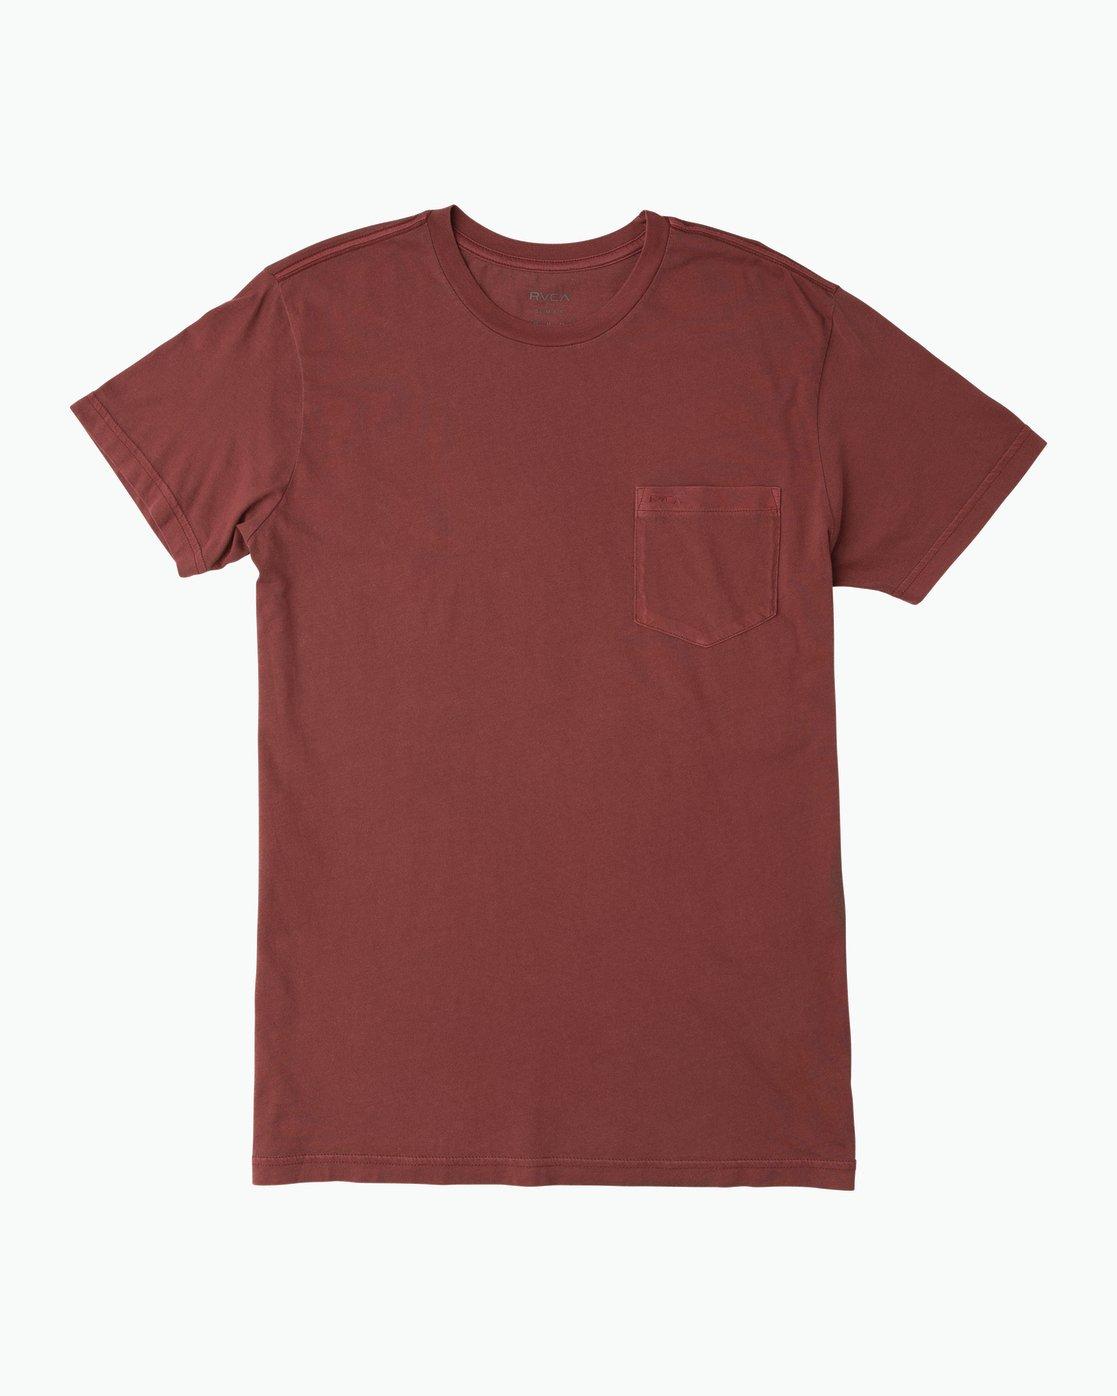 0 Ptc 2 Pigment T-Shirt Red M3910PTC RVCA